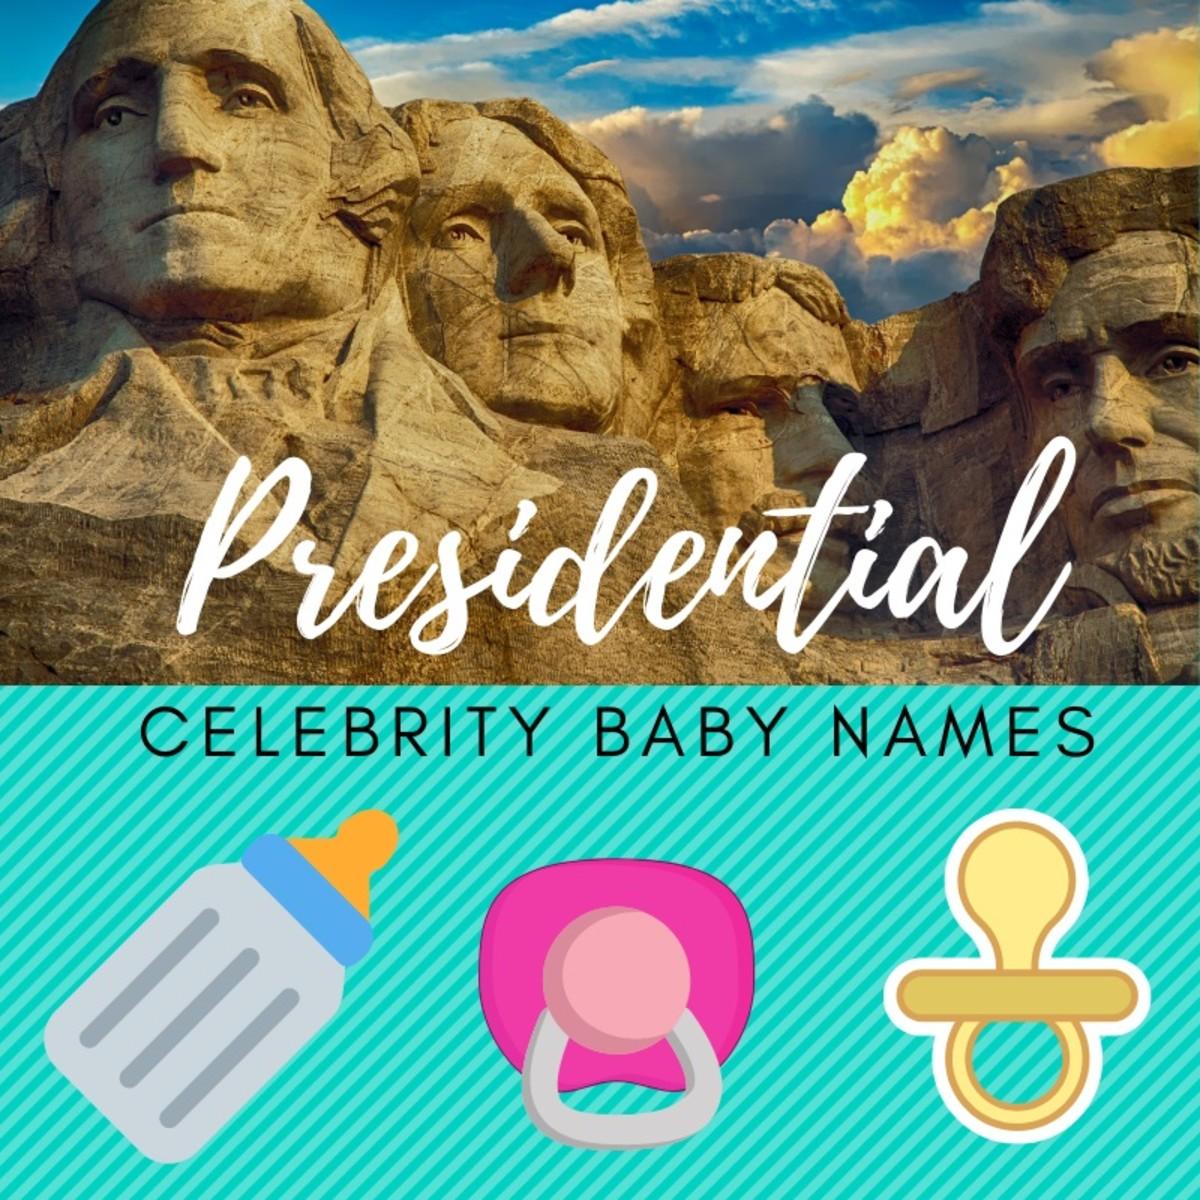 11 Presidential Celebrity Baby Names